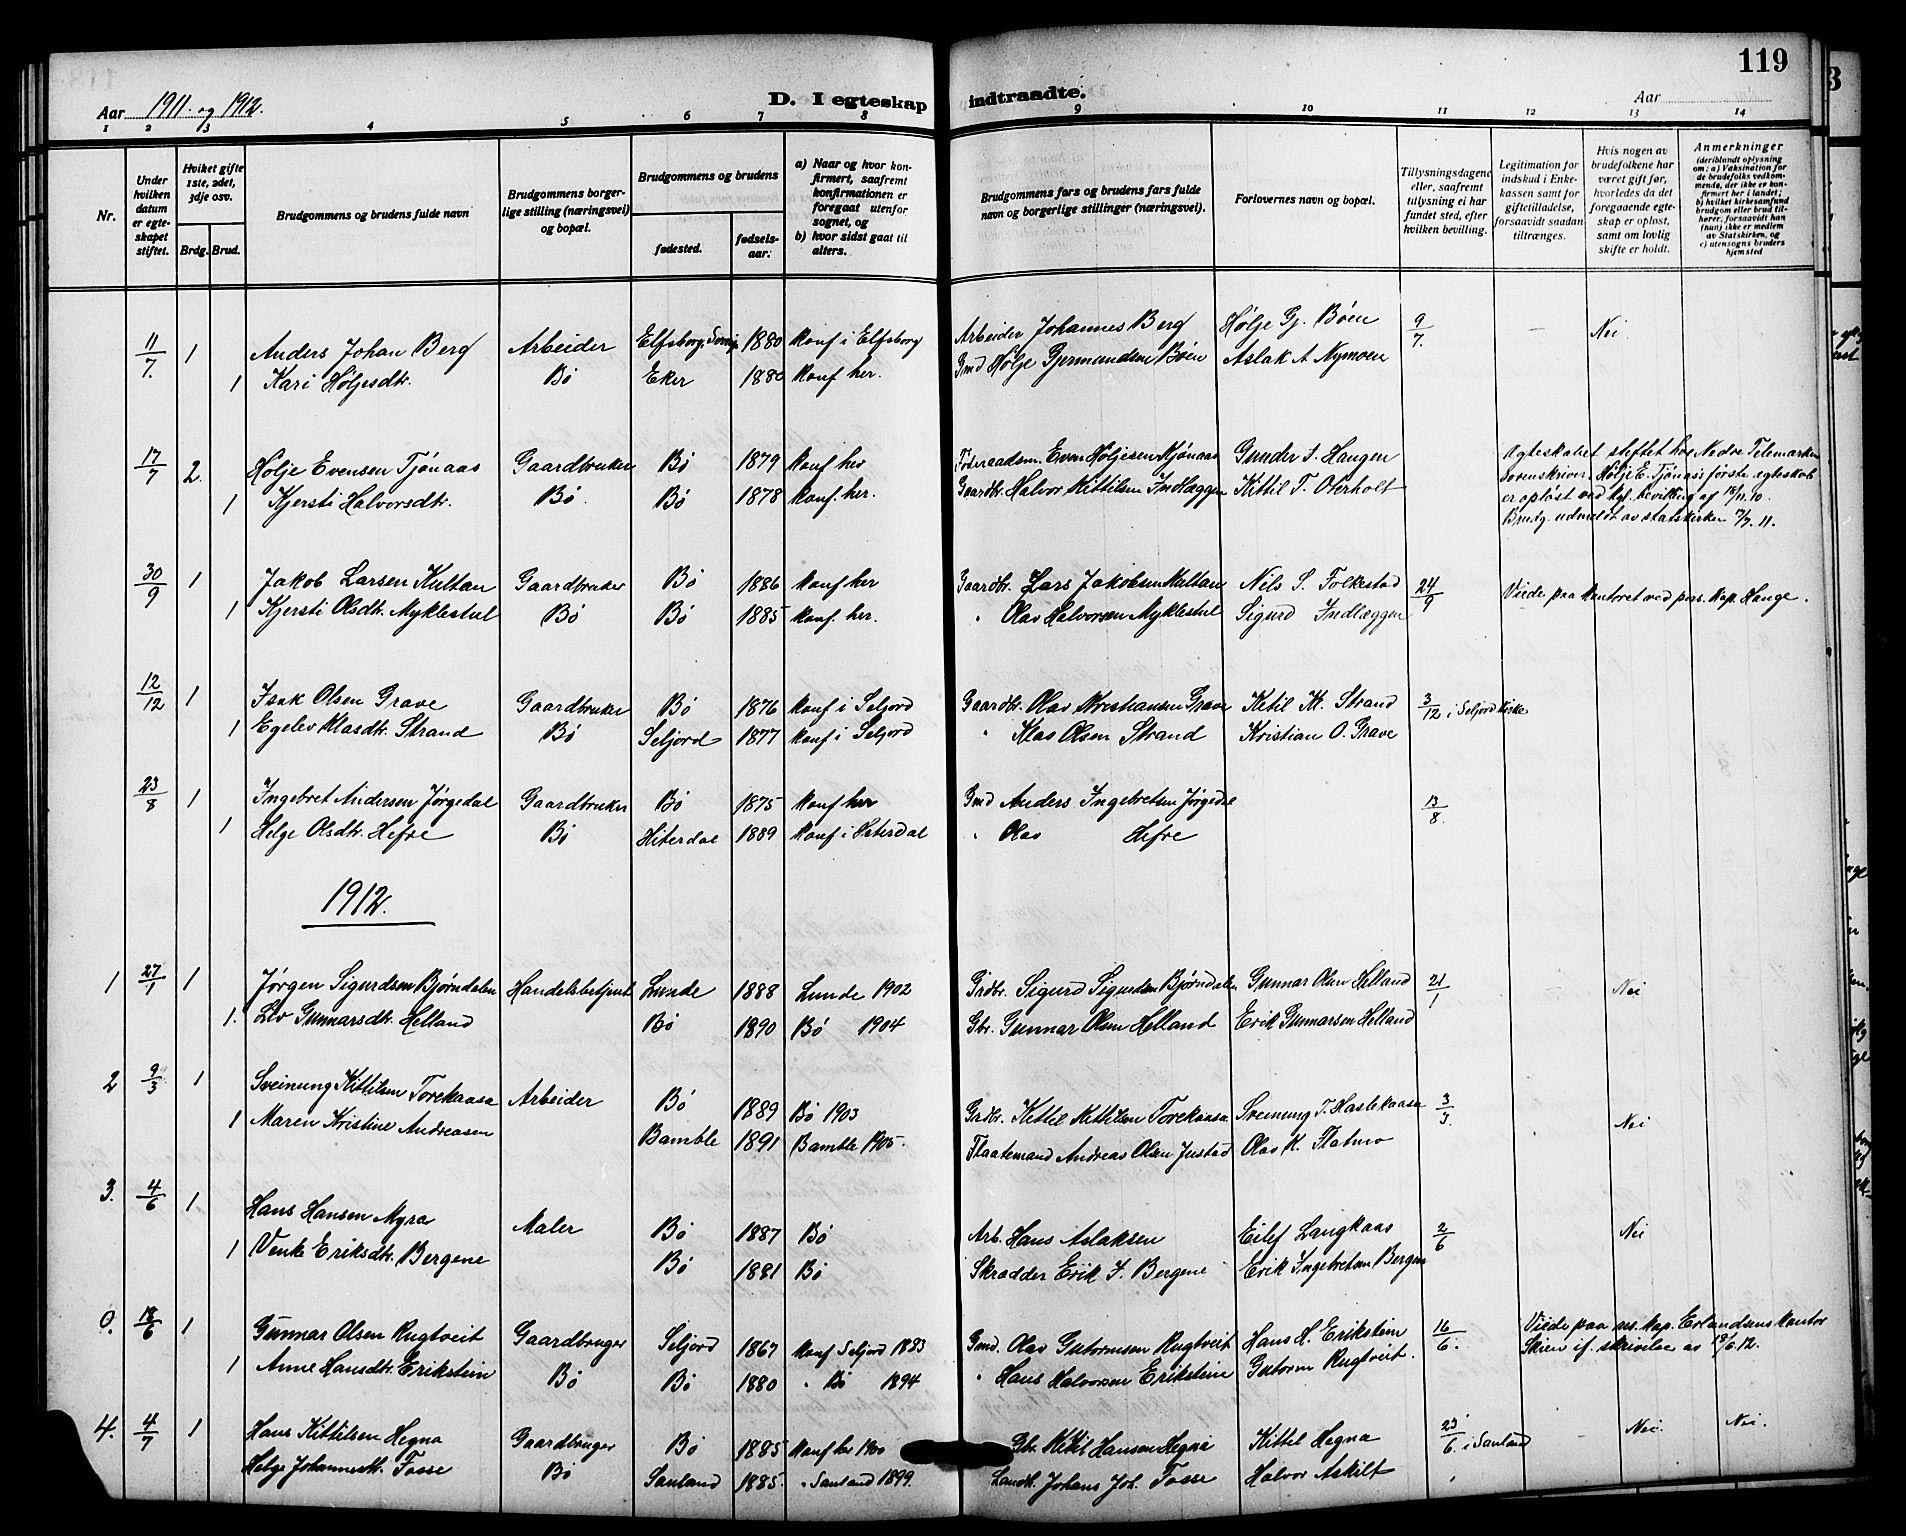 SAKO, Bø kirkebøker, G/Ga/L0007: Klokkerbok nr. 7, 1909-1924, s. 119